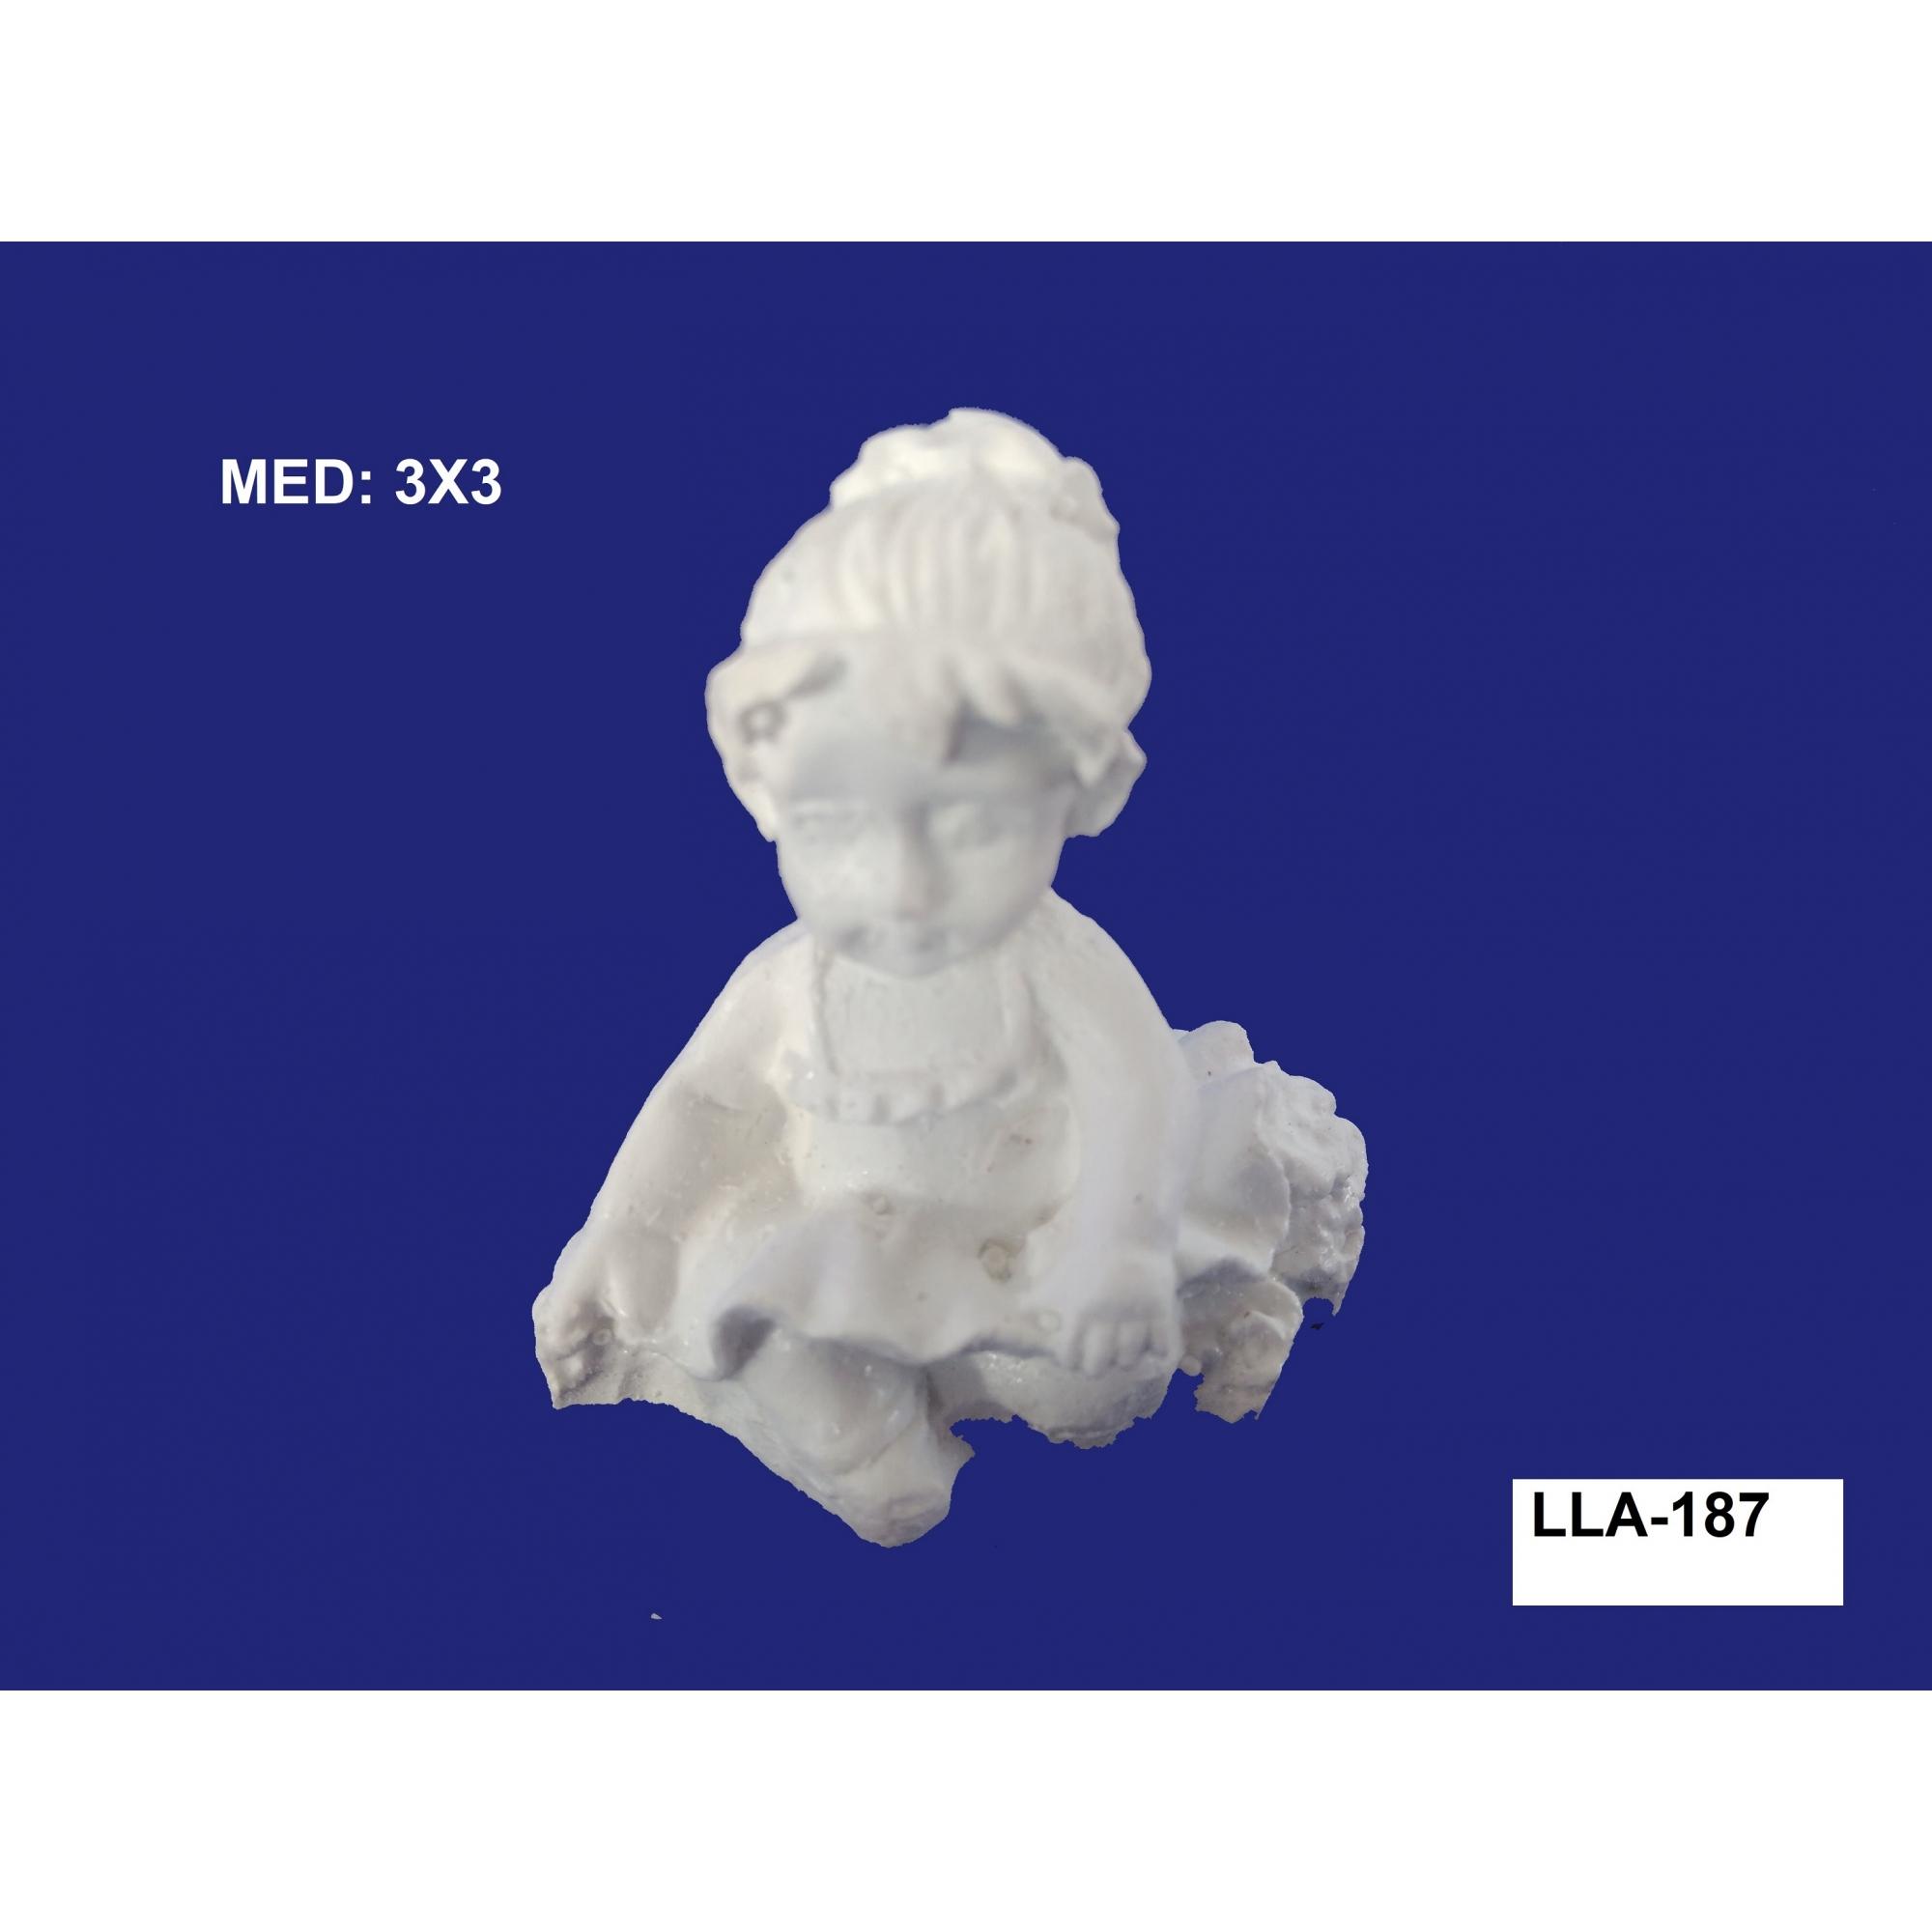 LLA-187 BAILARINA PEQ 3D 03X03CM